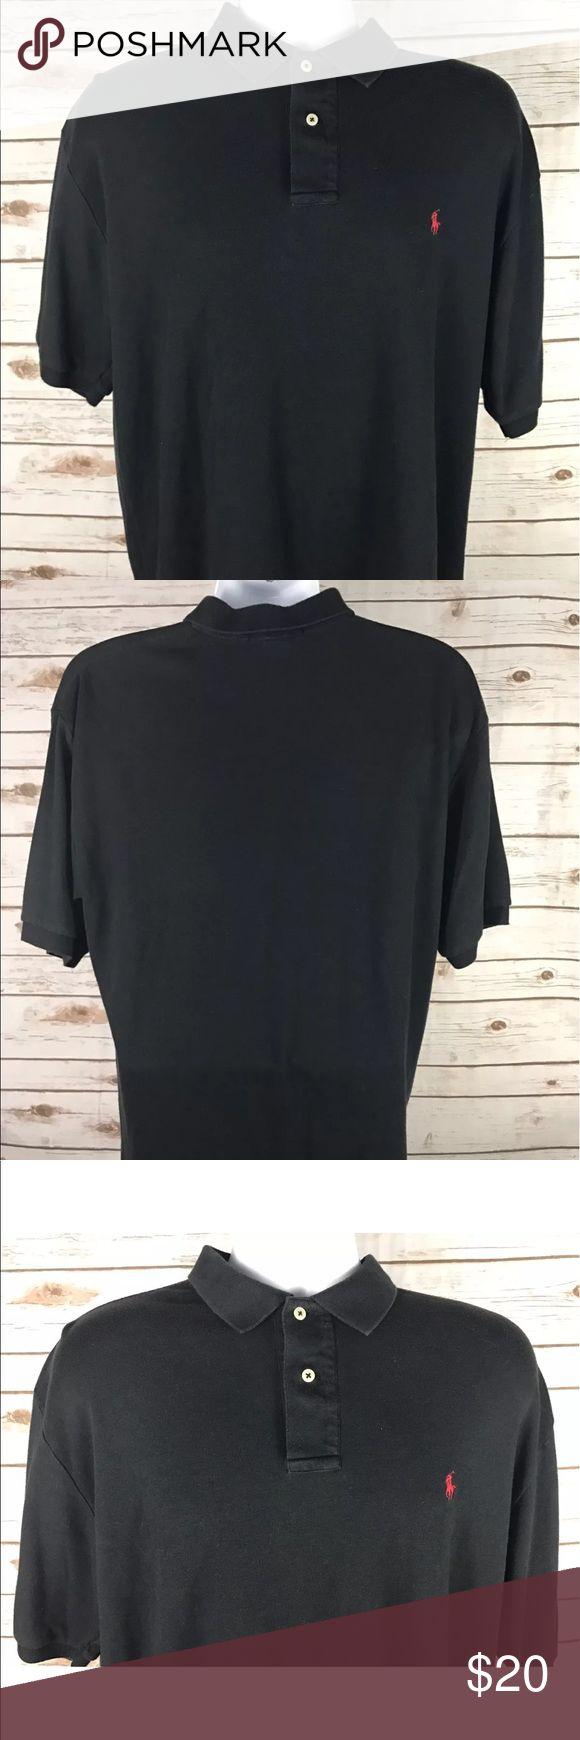 Men's Polo Ralph Lauren Black Polo shirt size M Men's Polo Ralph Lauren Black Polo shirt size M Polo by Ralph Lauren Shirts Polos